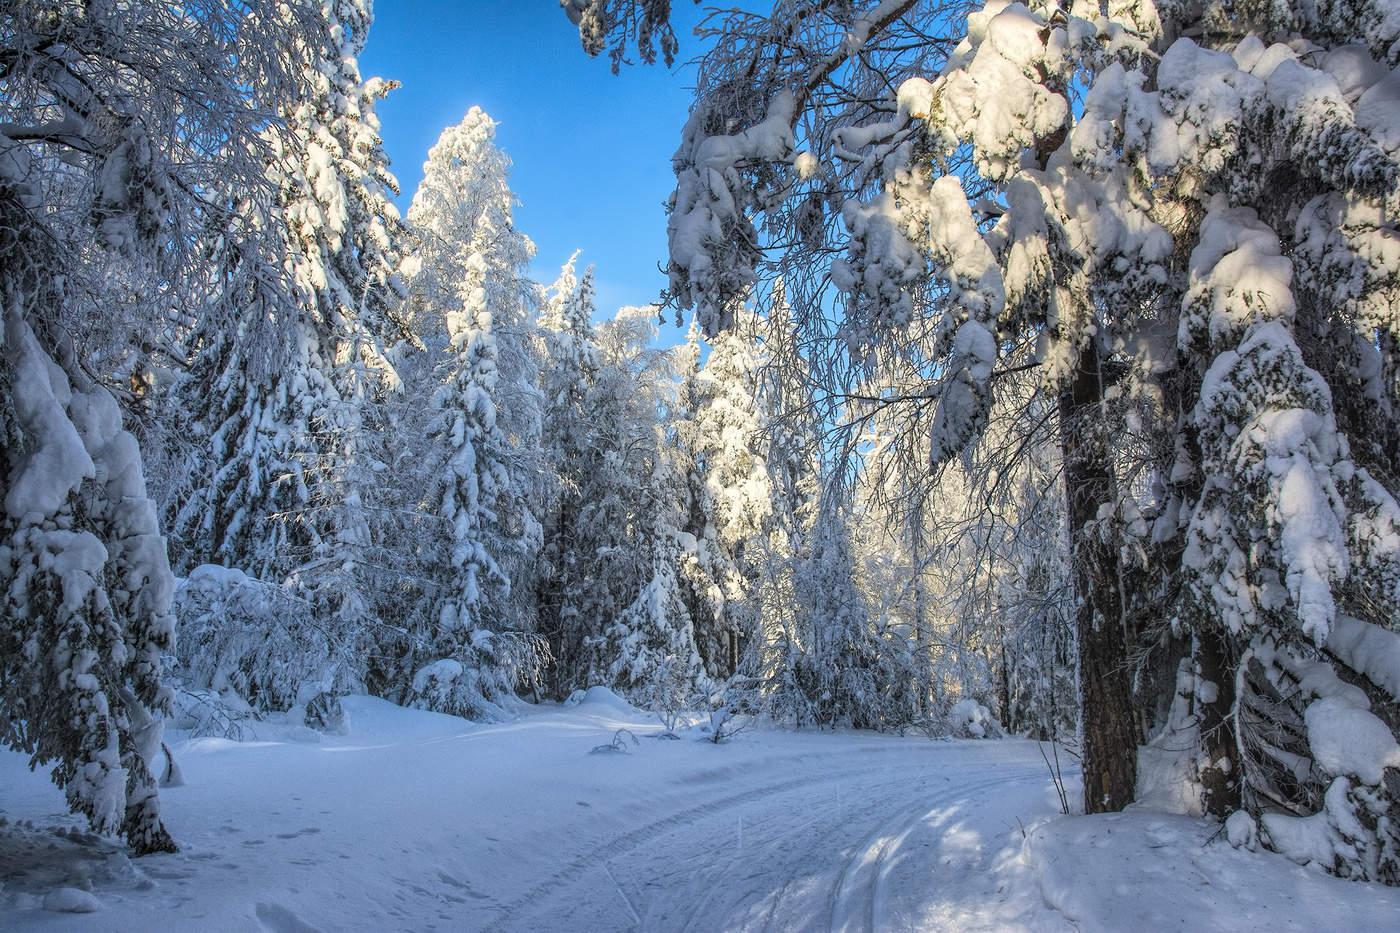 Картинки зимнего леса фото